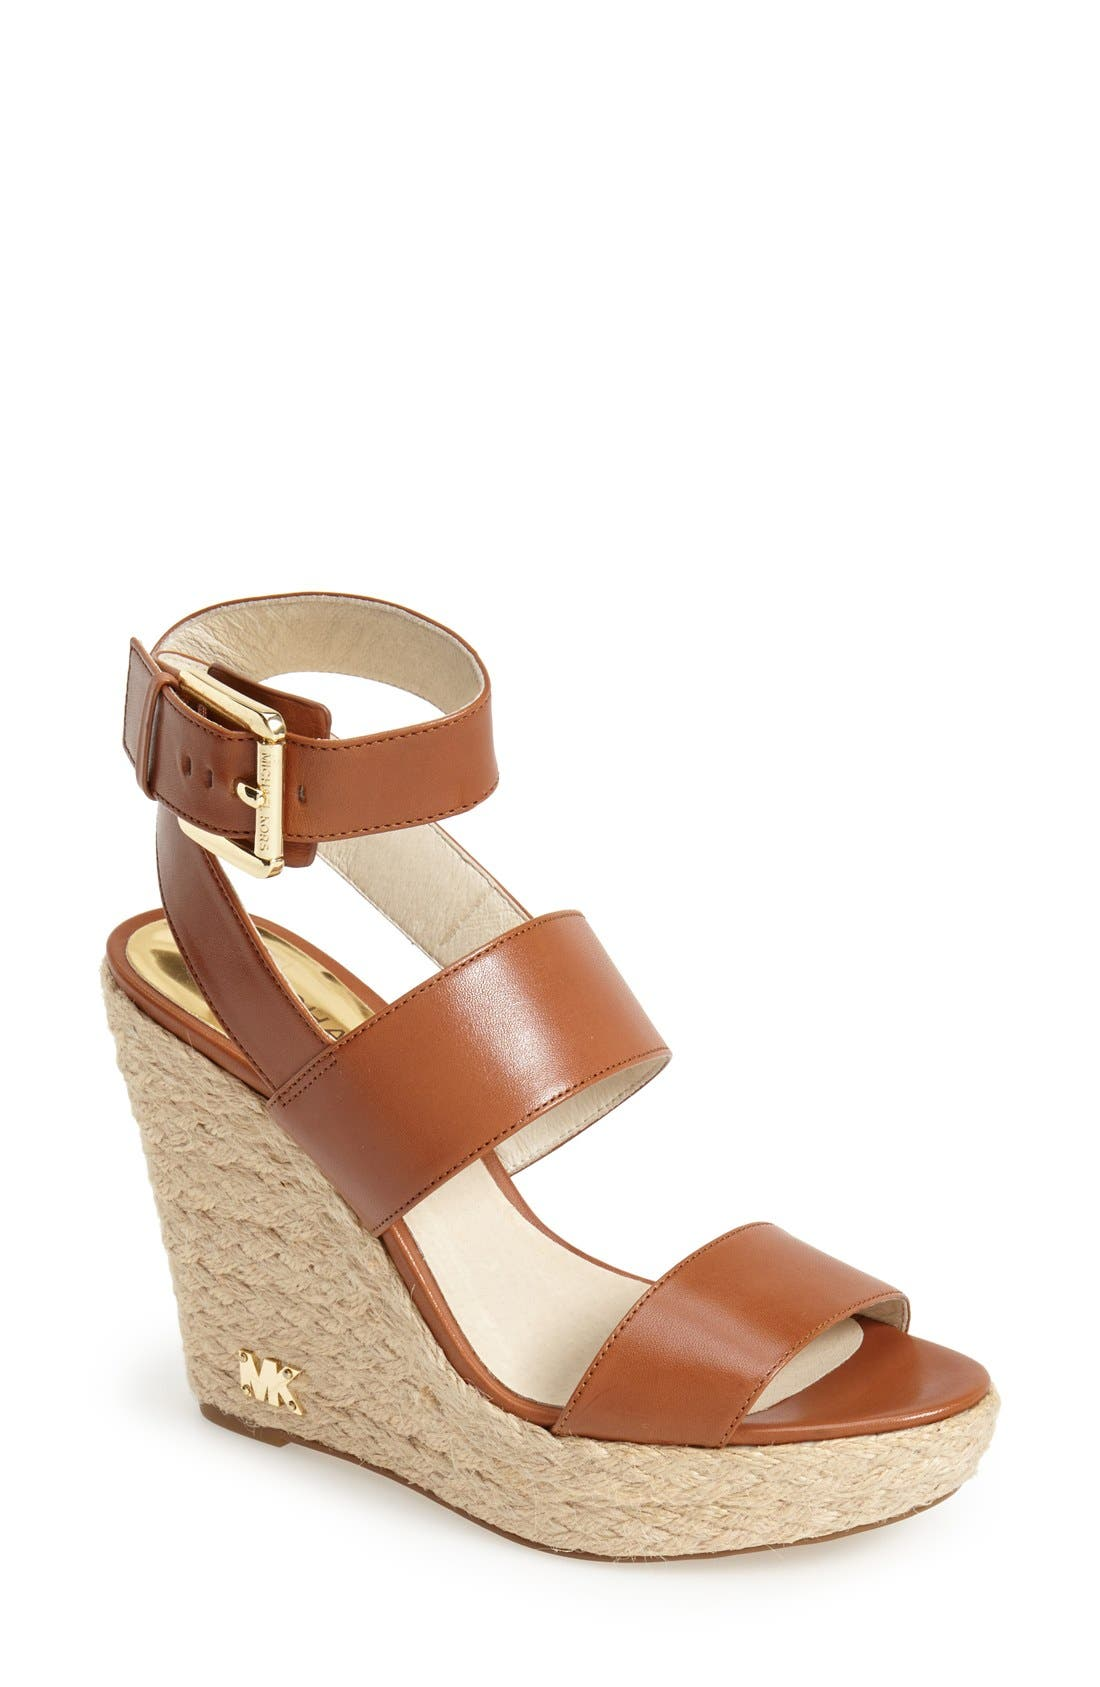 Alternate Image 1 Selected - MICHAEL Michael Kors 'Posey' Ankle Strap Espadrille Wedge Sandal (Women)